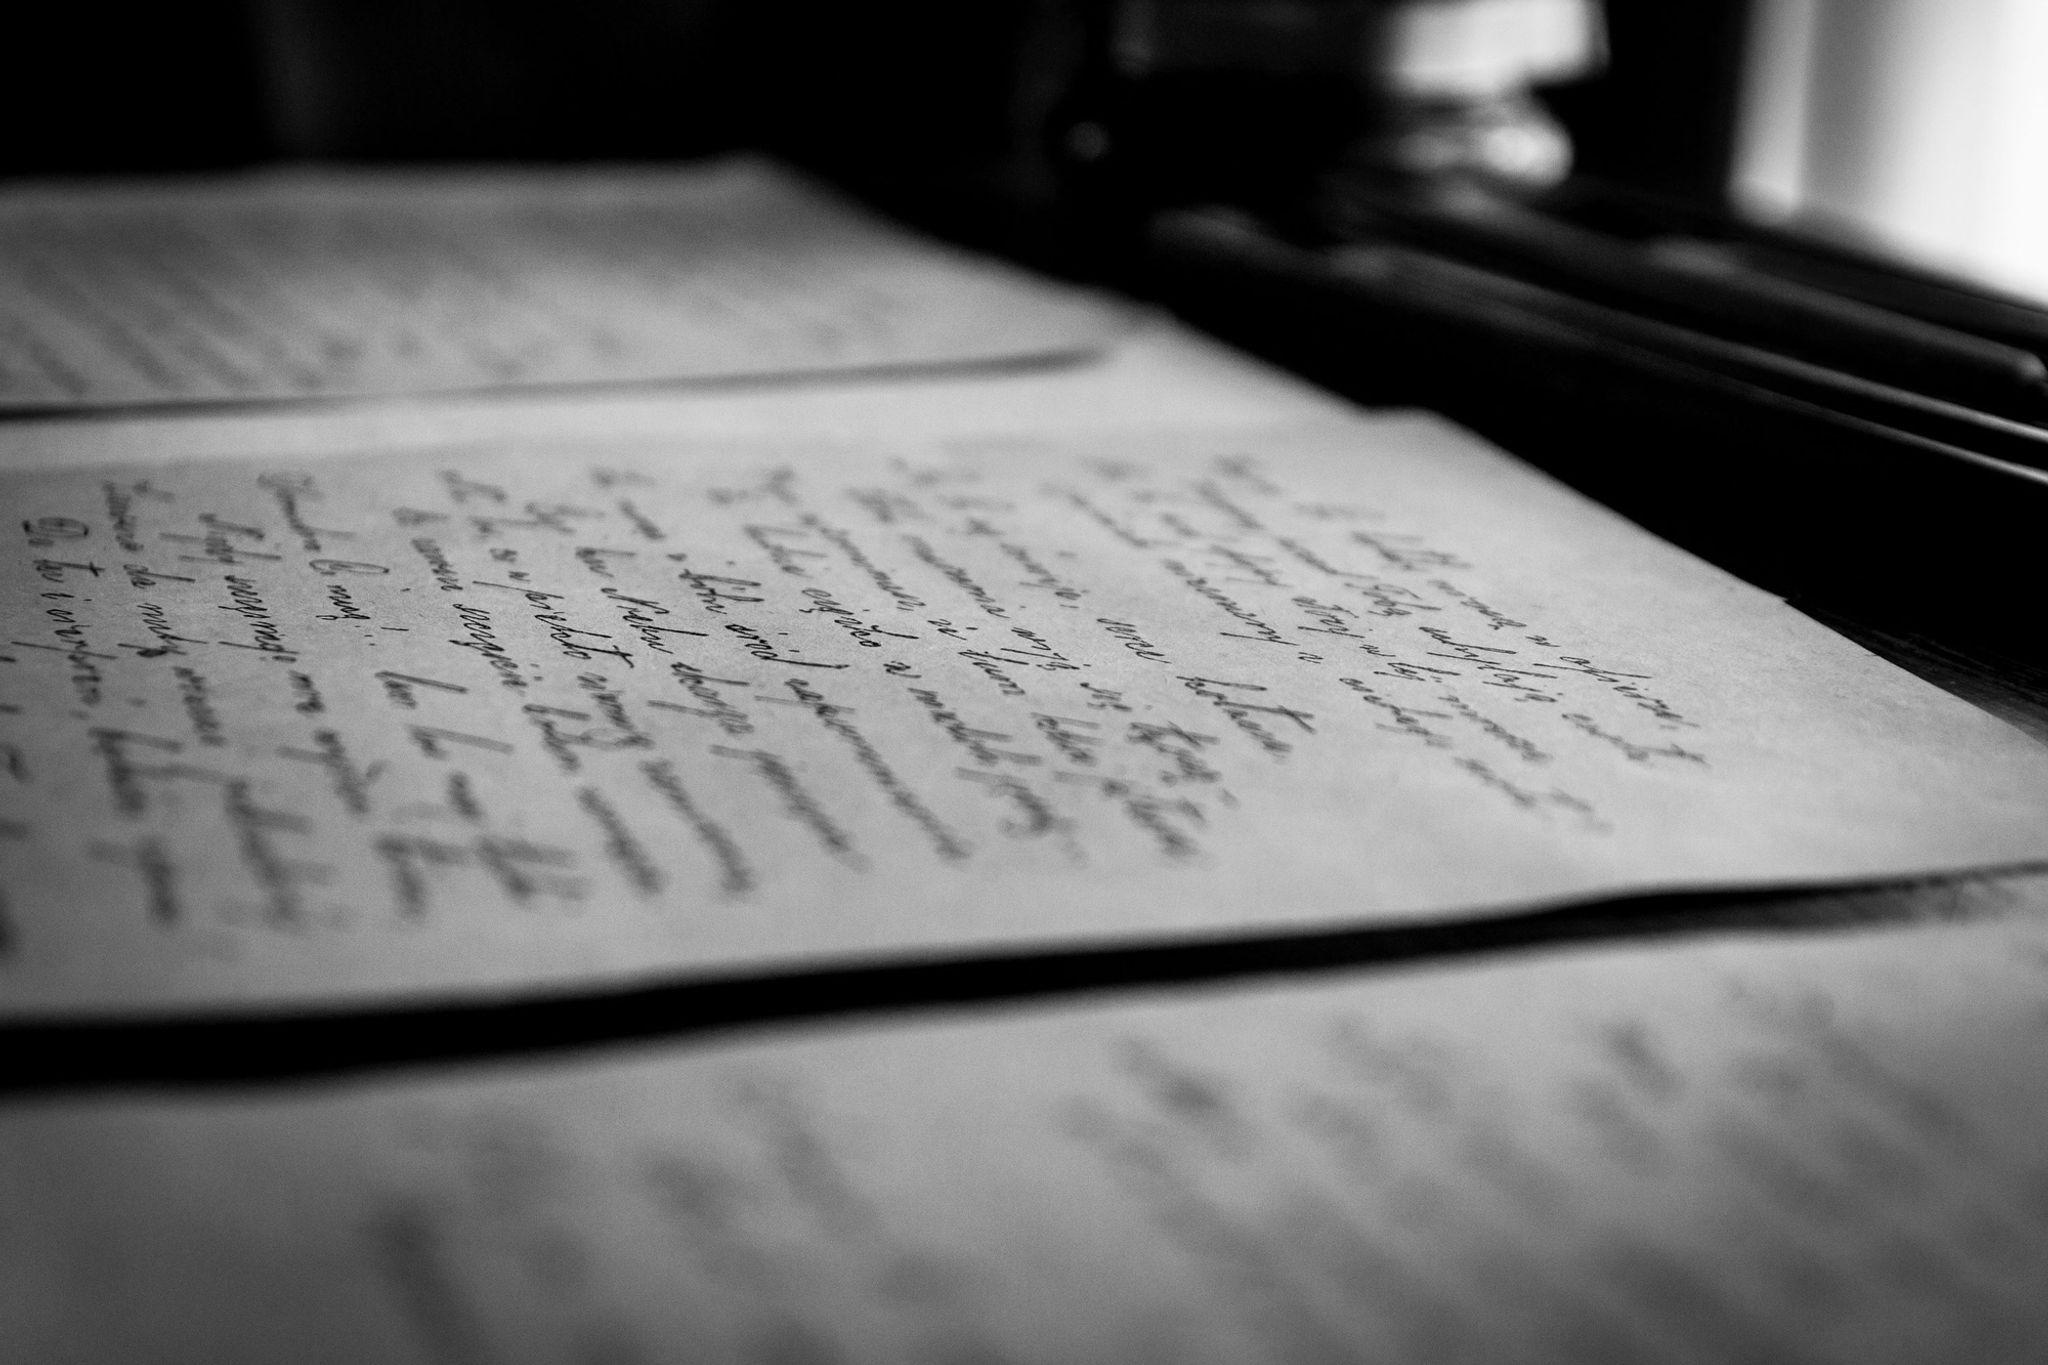 transfer student essays